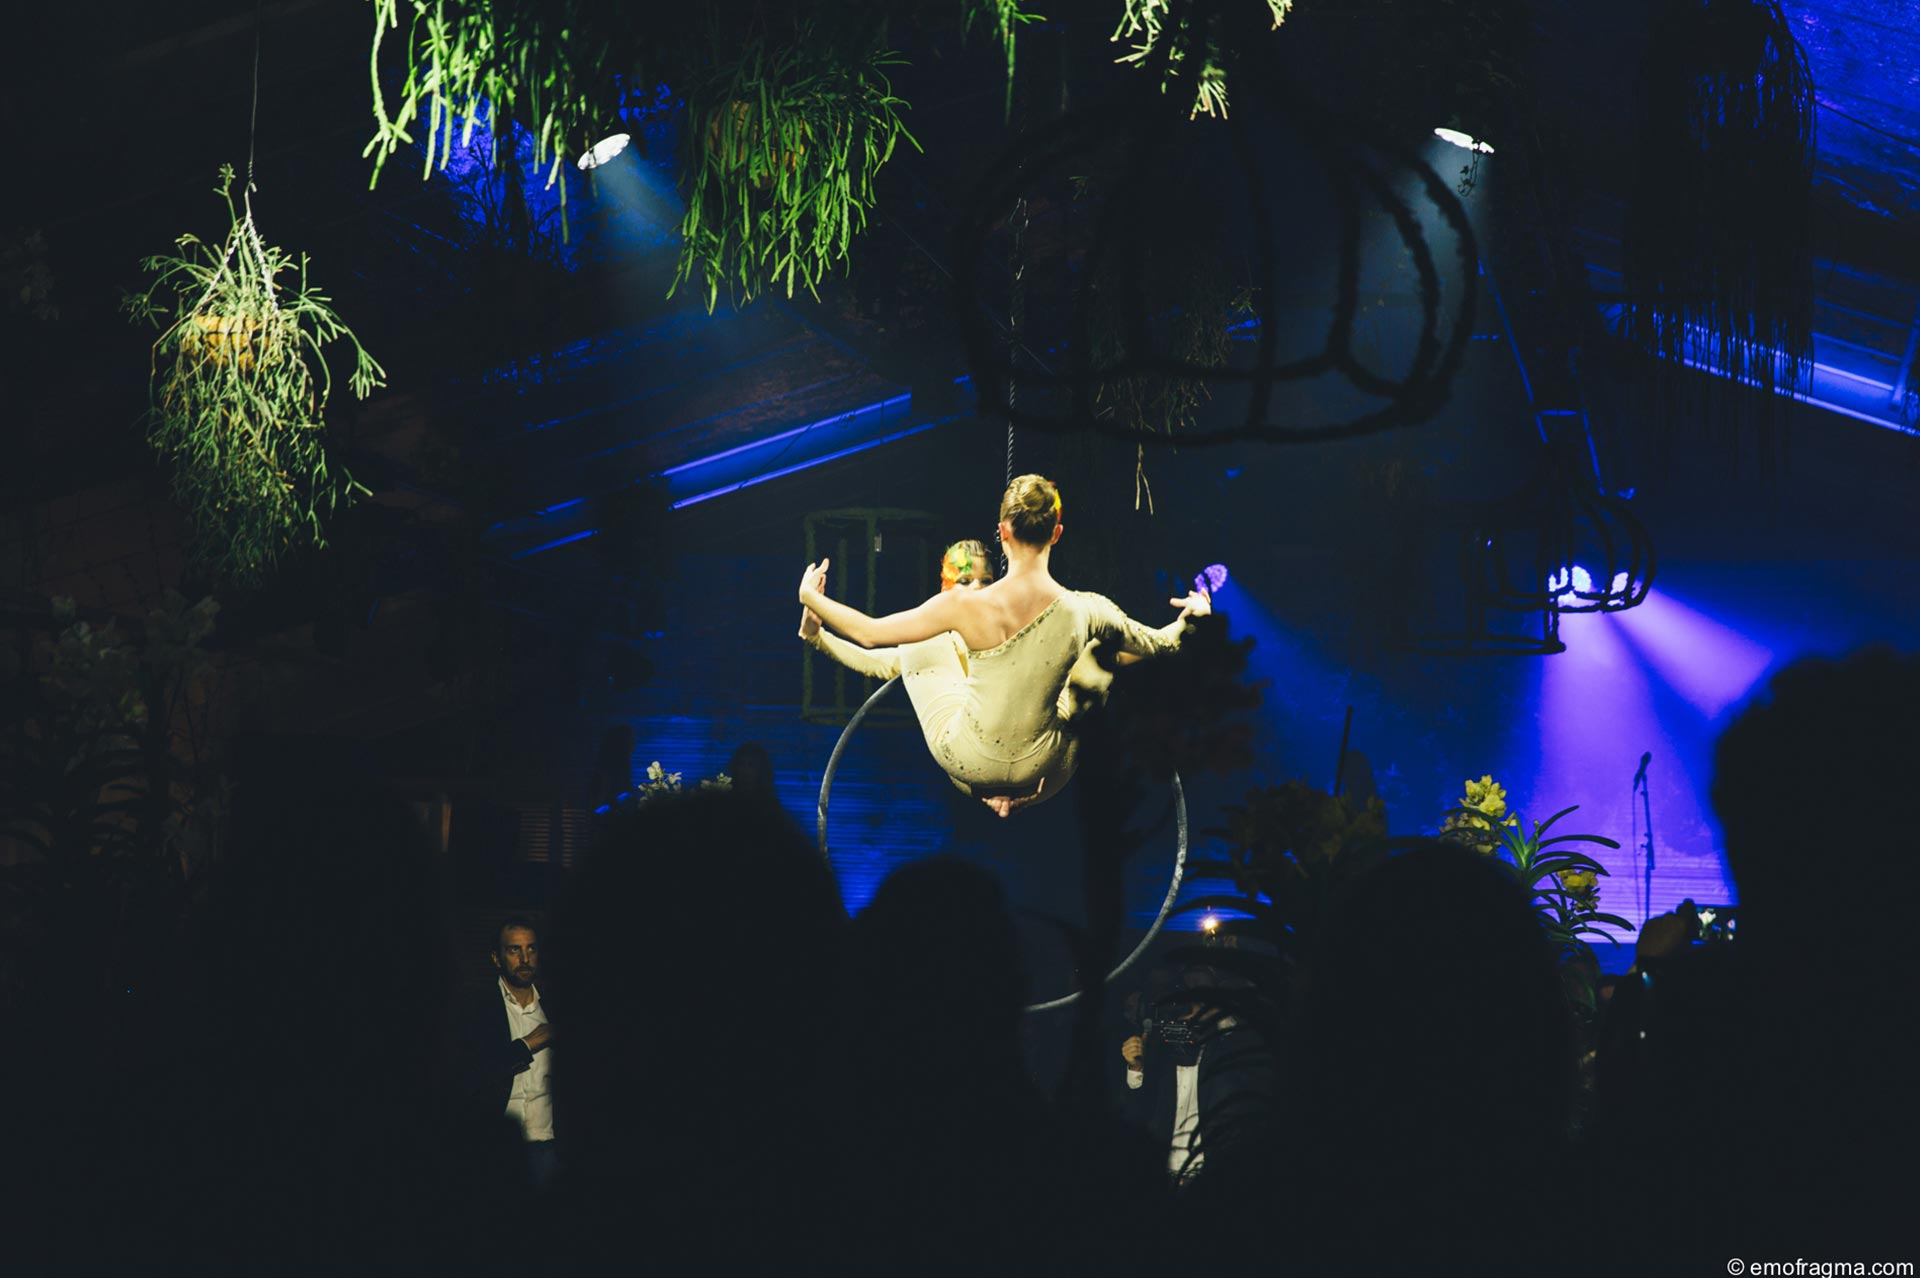 Compagnie_newa_ring_lyra_hoop_circus_aerials_luchtacrobatiek